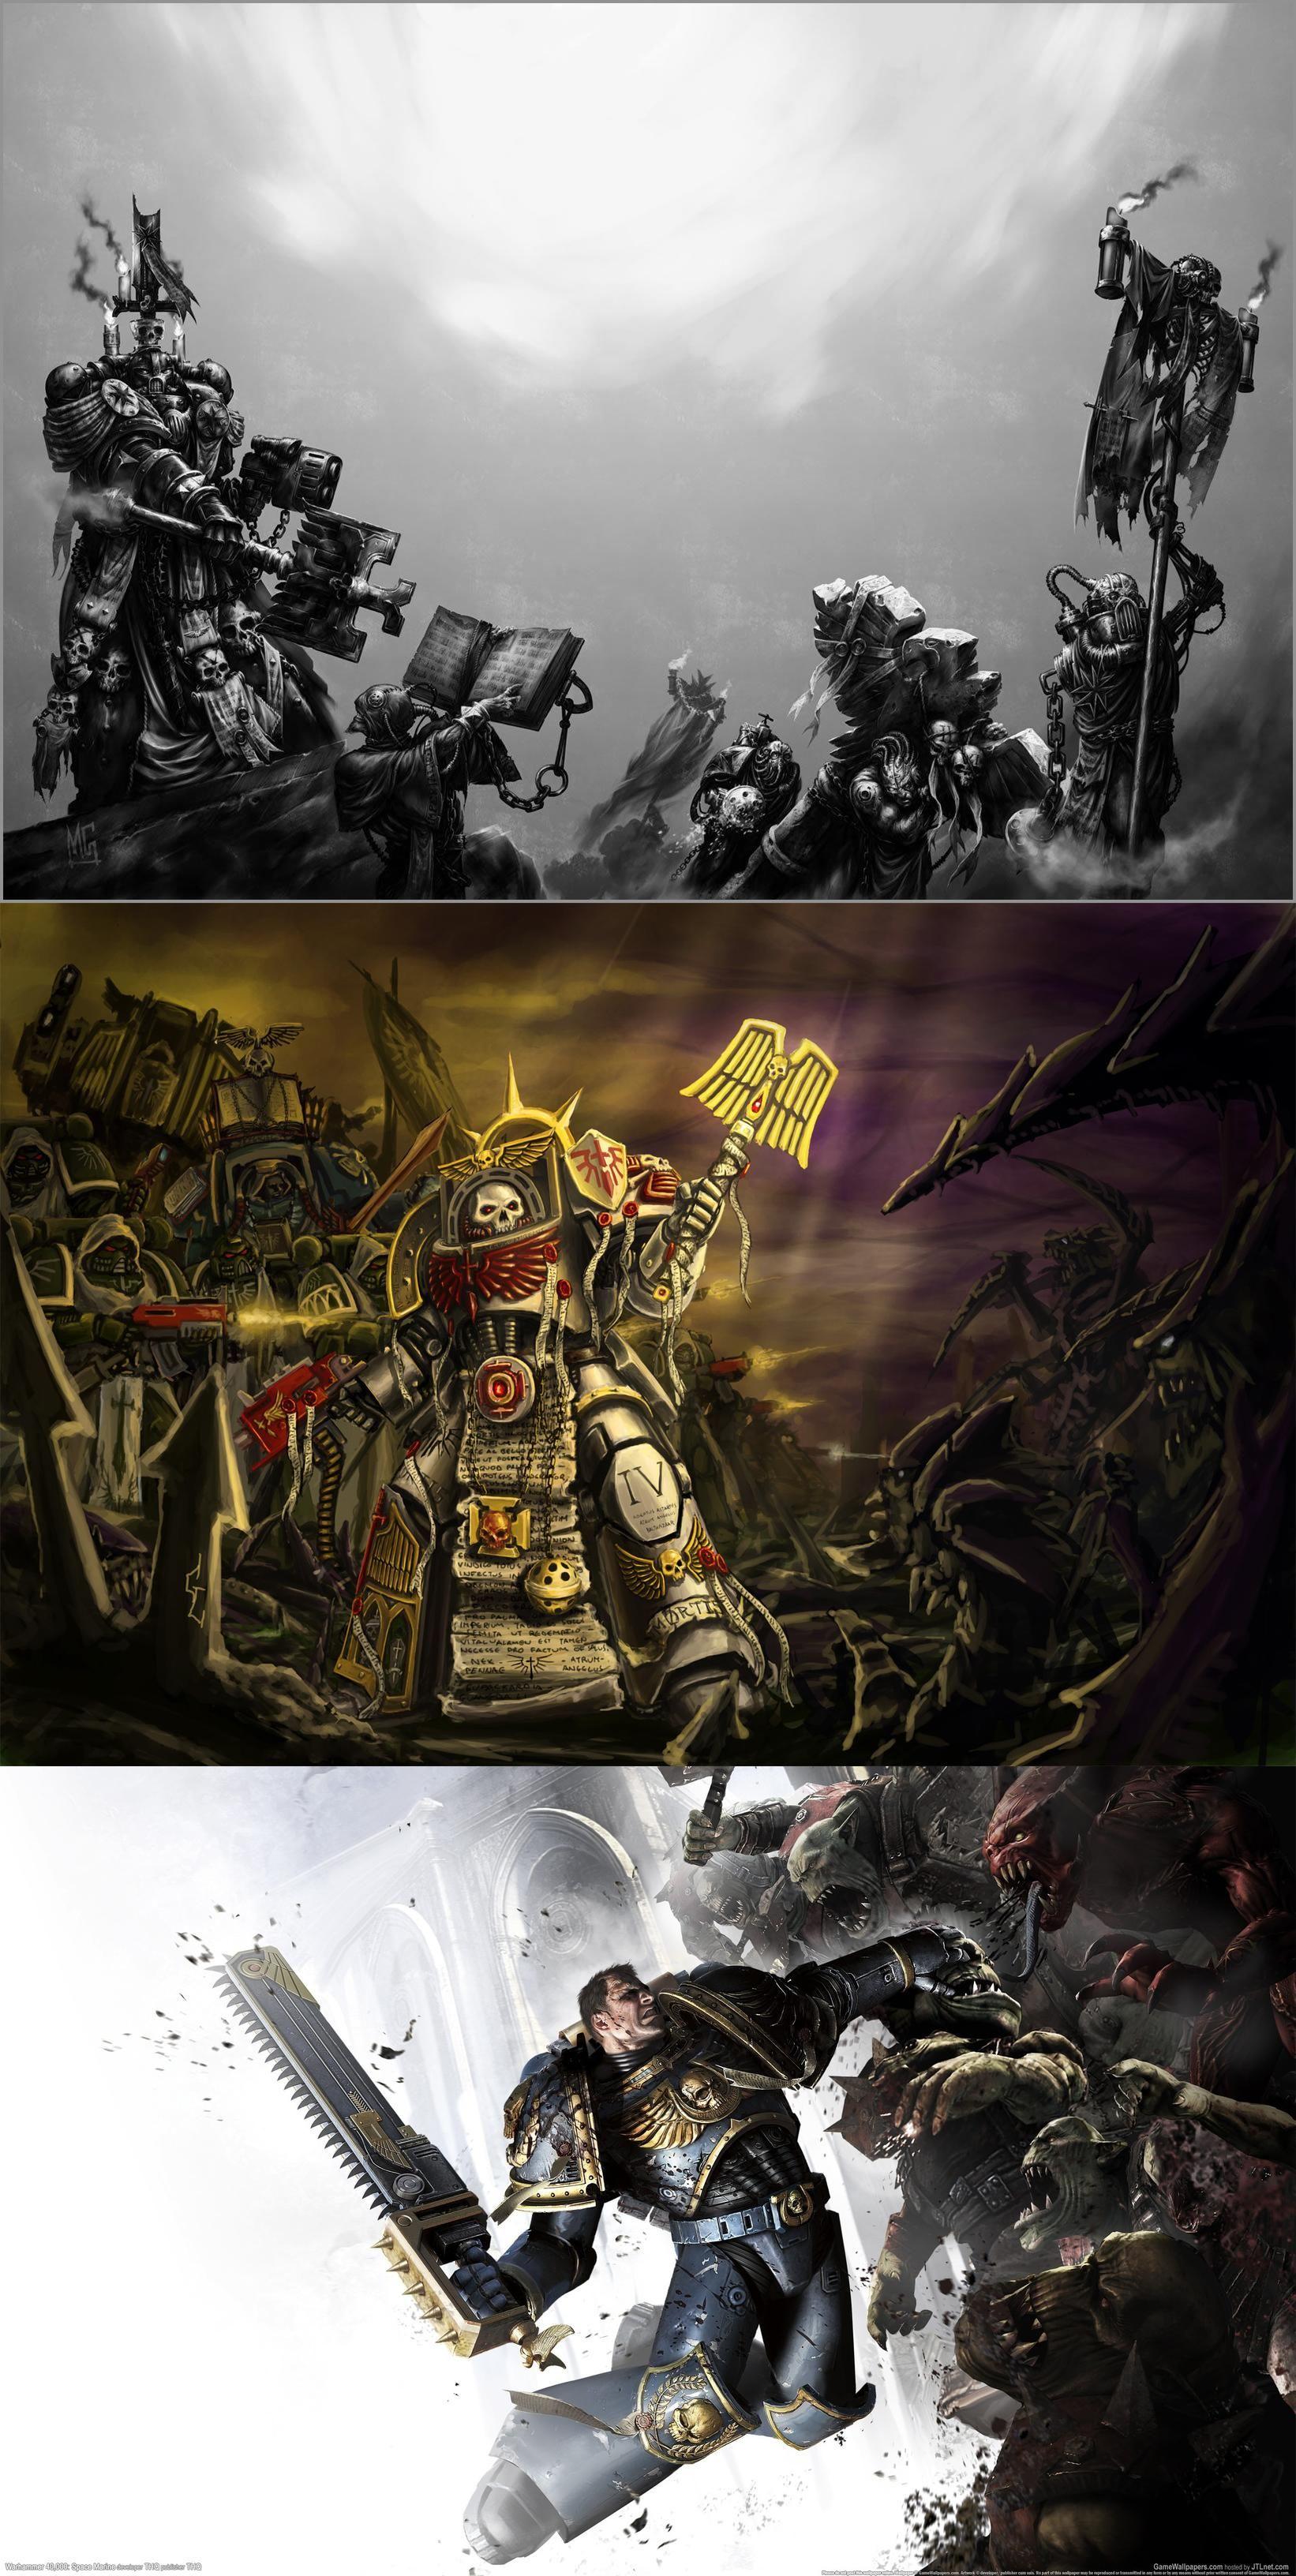 Warhammer 40k, dark angels, the chaplain, the soldiers